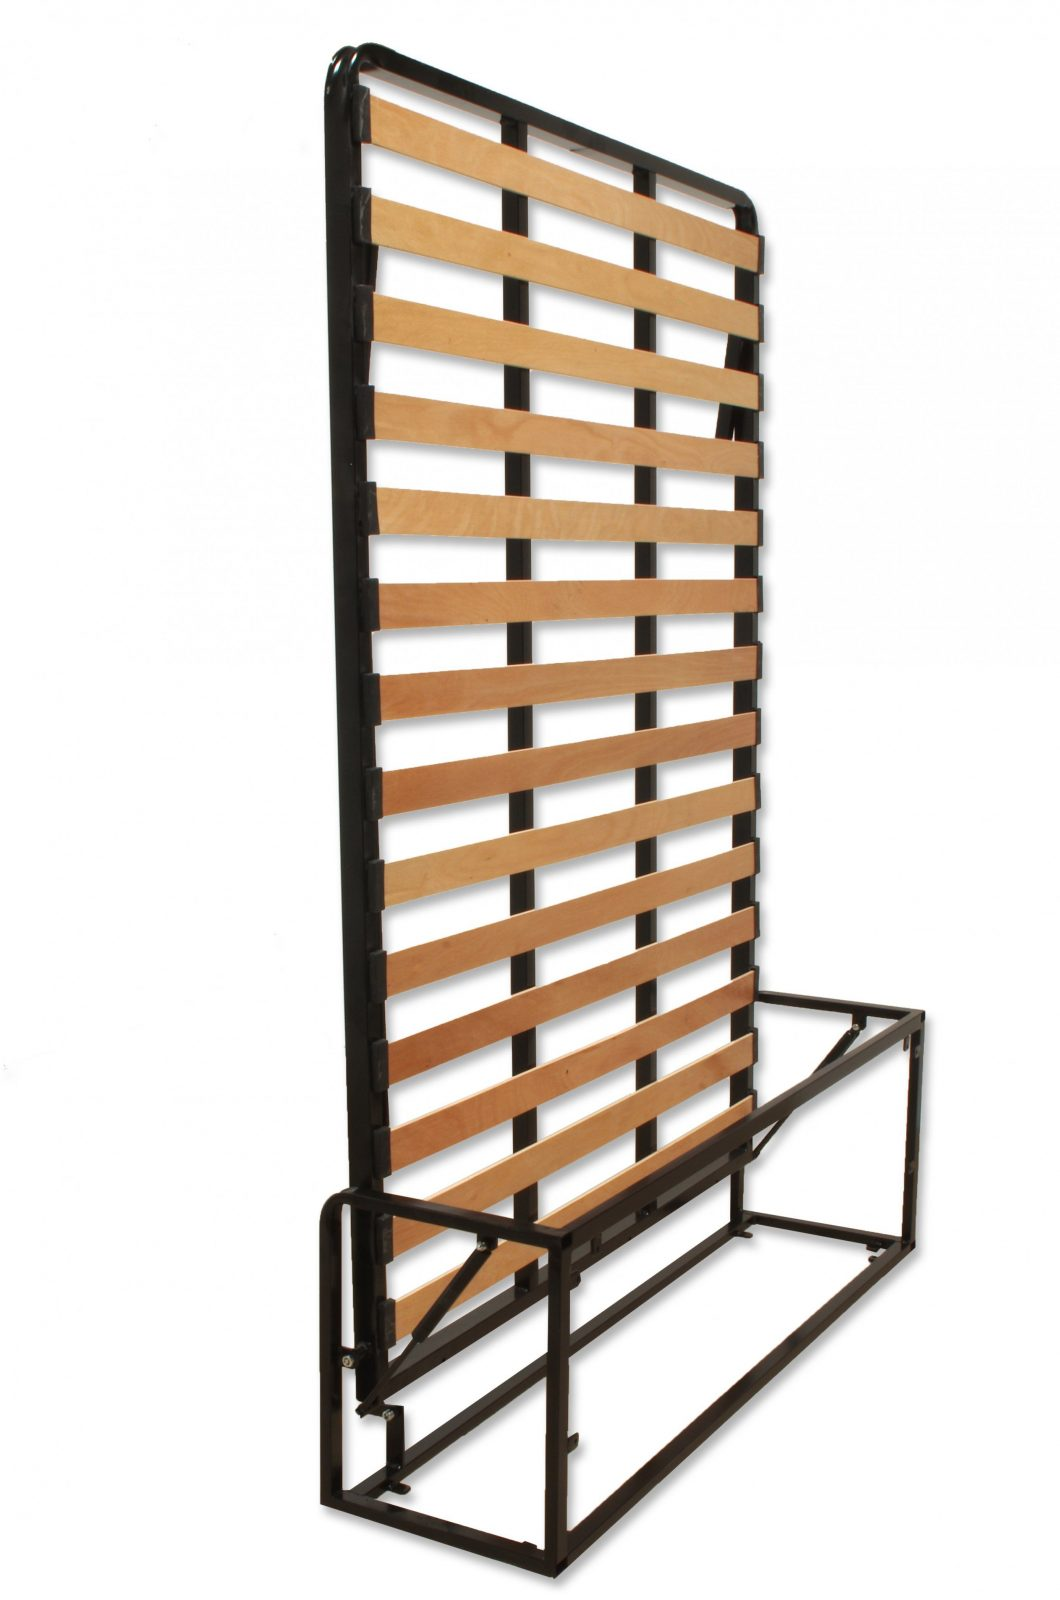 schrankbett 140x200 selber bauen haus design ideen. Black Bedroom Furniture Sets. Home Design Ideas